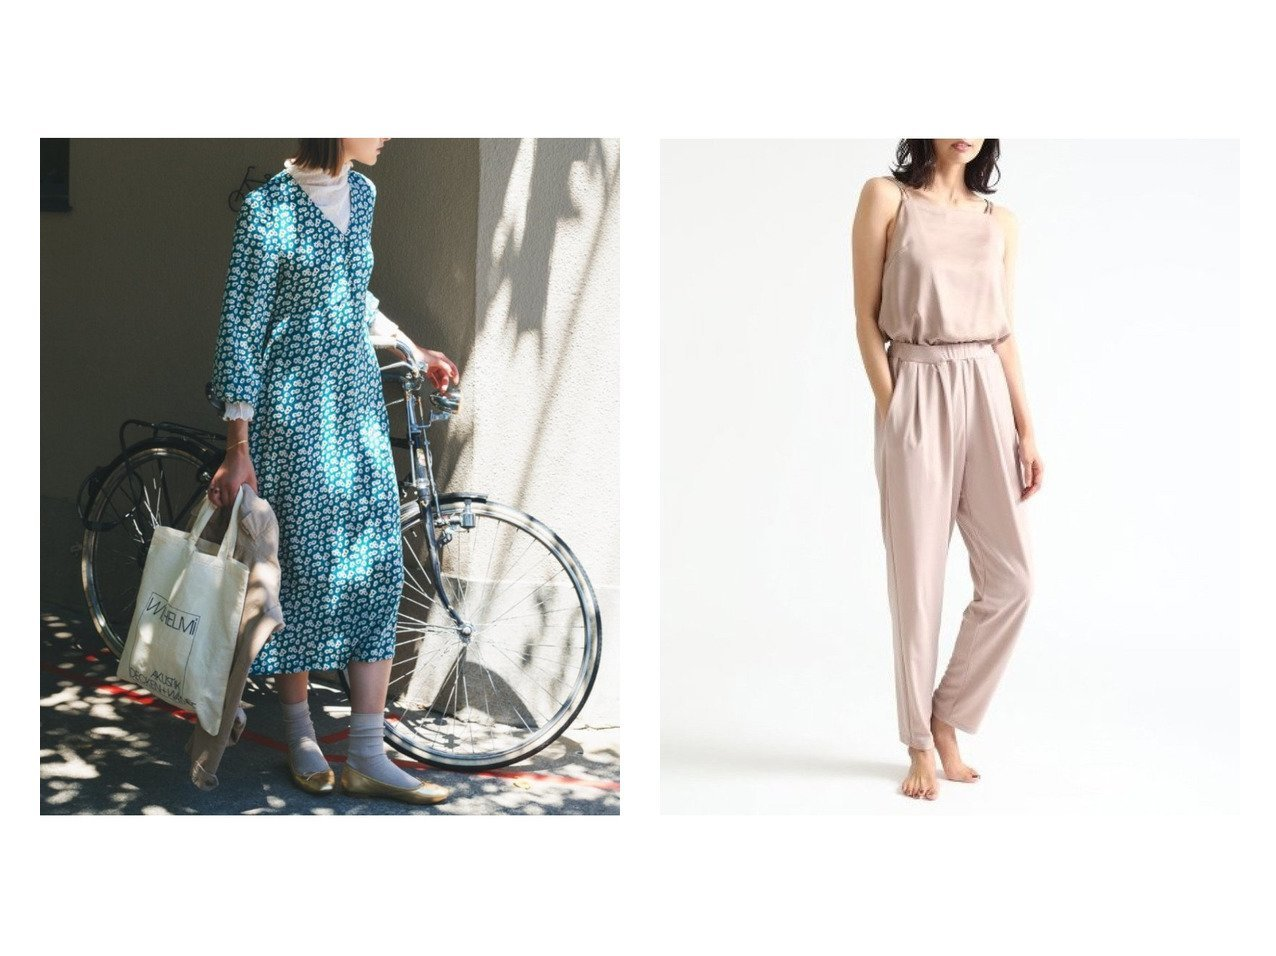 【FRAY I.D/フレイ アイディー】の異素材オールインワン&【ROPE' mademoiselle/ロペ マドモアゼル】のヴィンテージライクフラワーレディワンピース ワンピース・ドレスのおすすめ!人気、トレンド・レディースファッションの通販  おすすめで人気の流行・トレンド、ファッションの通販商品 メンズファッション・キッズファッション・インテリア・家具・レディースファッション・服の通販 founy(ファニー) https://founy.com/ ファッション Fashion レディースファッション WOMEN ワンピース Dress オールインワン ワンピース All In One Dress インナー スニーカー フラワー プリント ポケット リラックス キャミソール コンビ ストレッチ スポーティ ドッキング ヨガ 洗える |ID:crp329100000010191